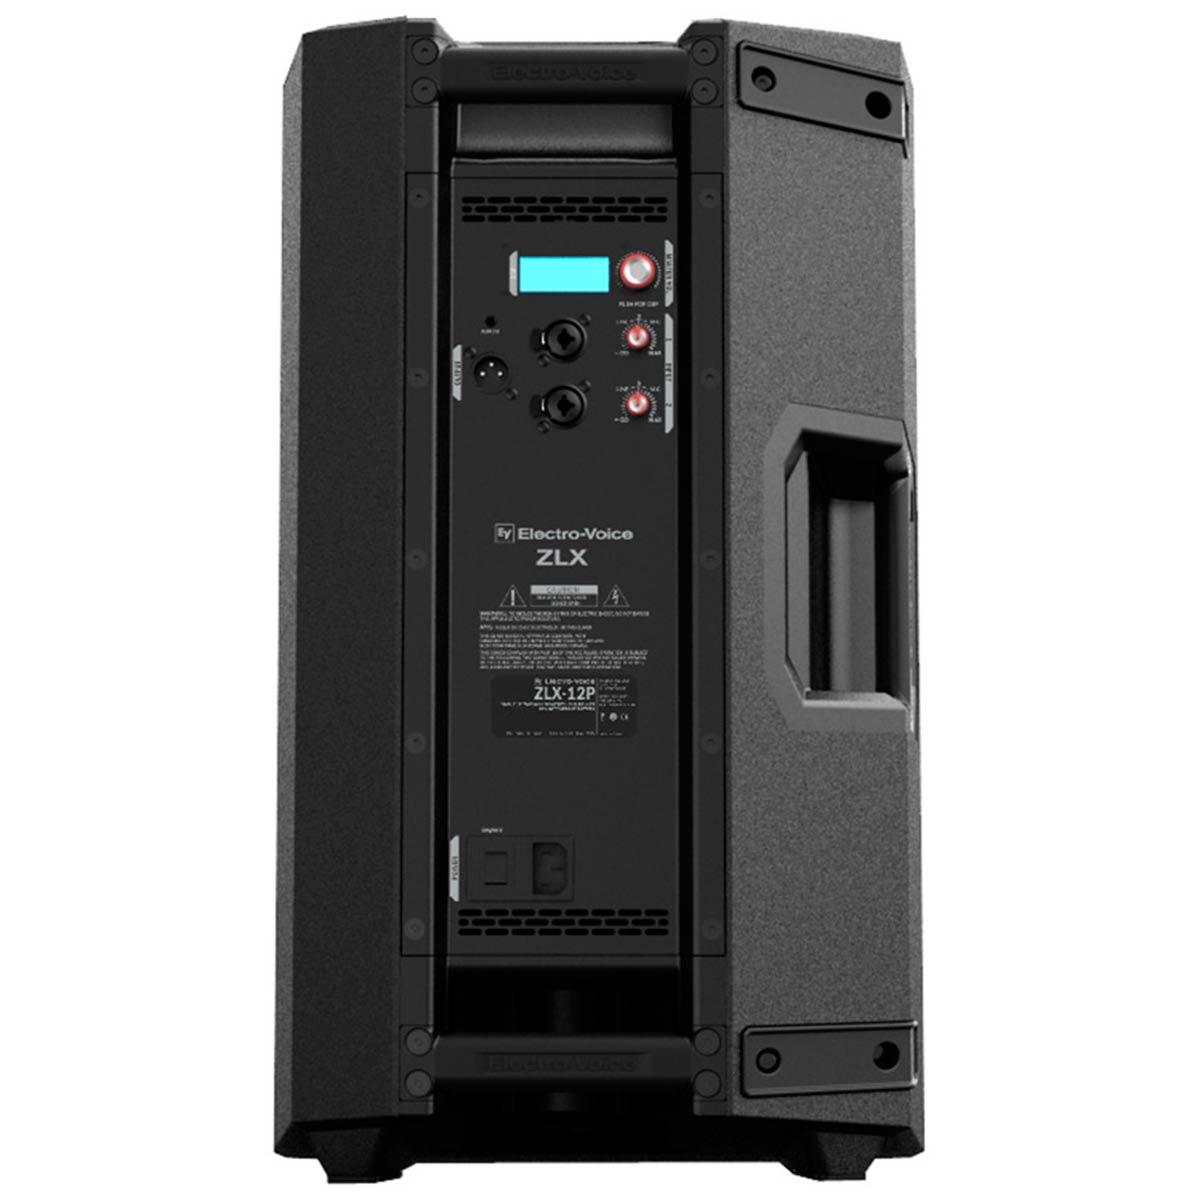 Caixa Ativa Fal 12 Pol 1000W - ZLX 12 P Electro-Voice